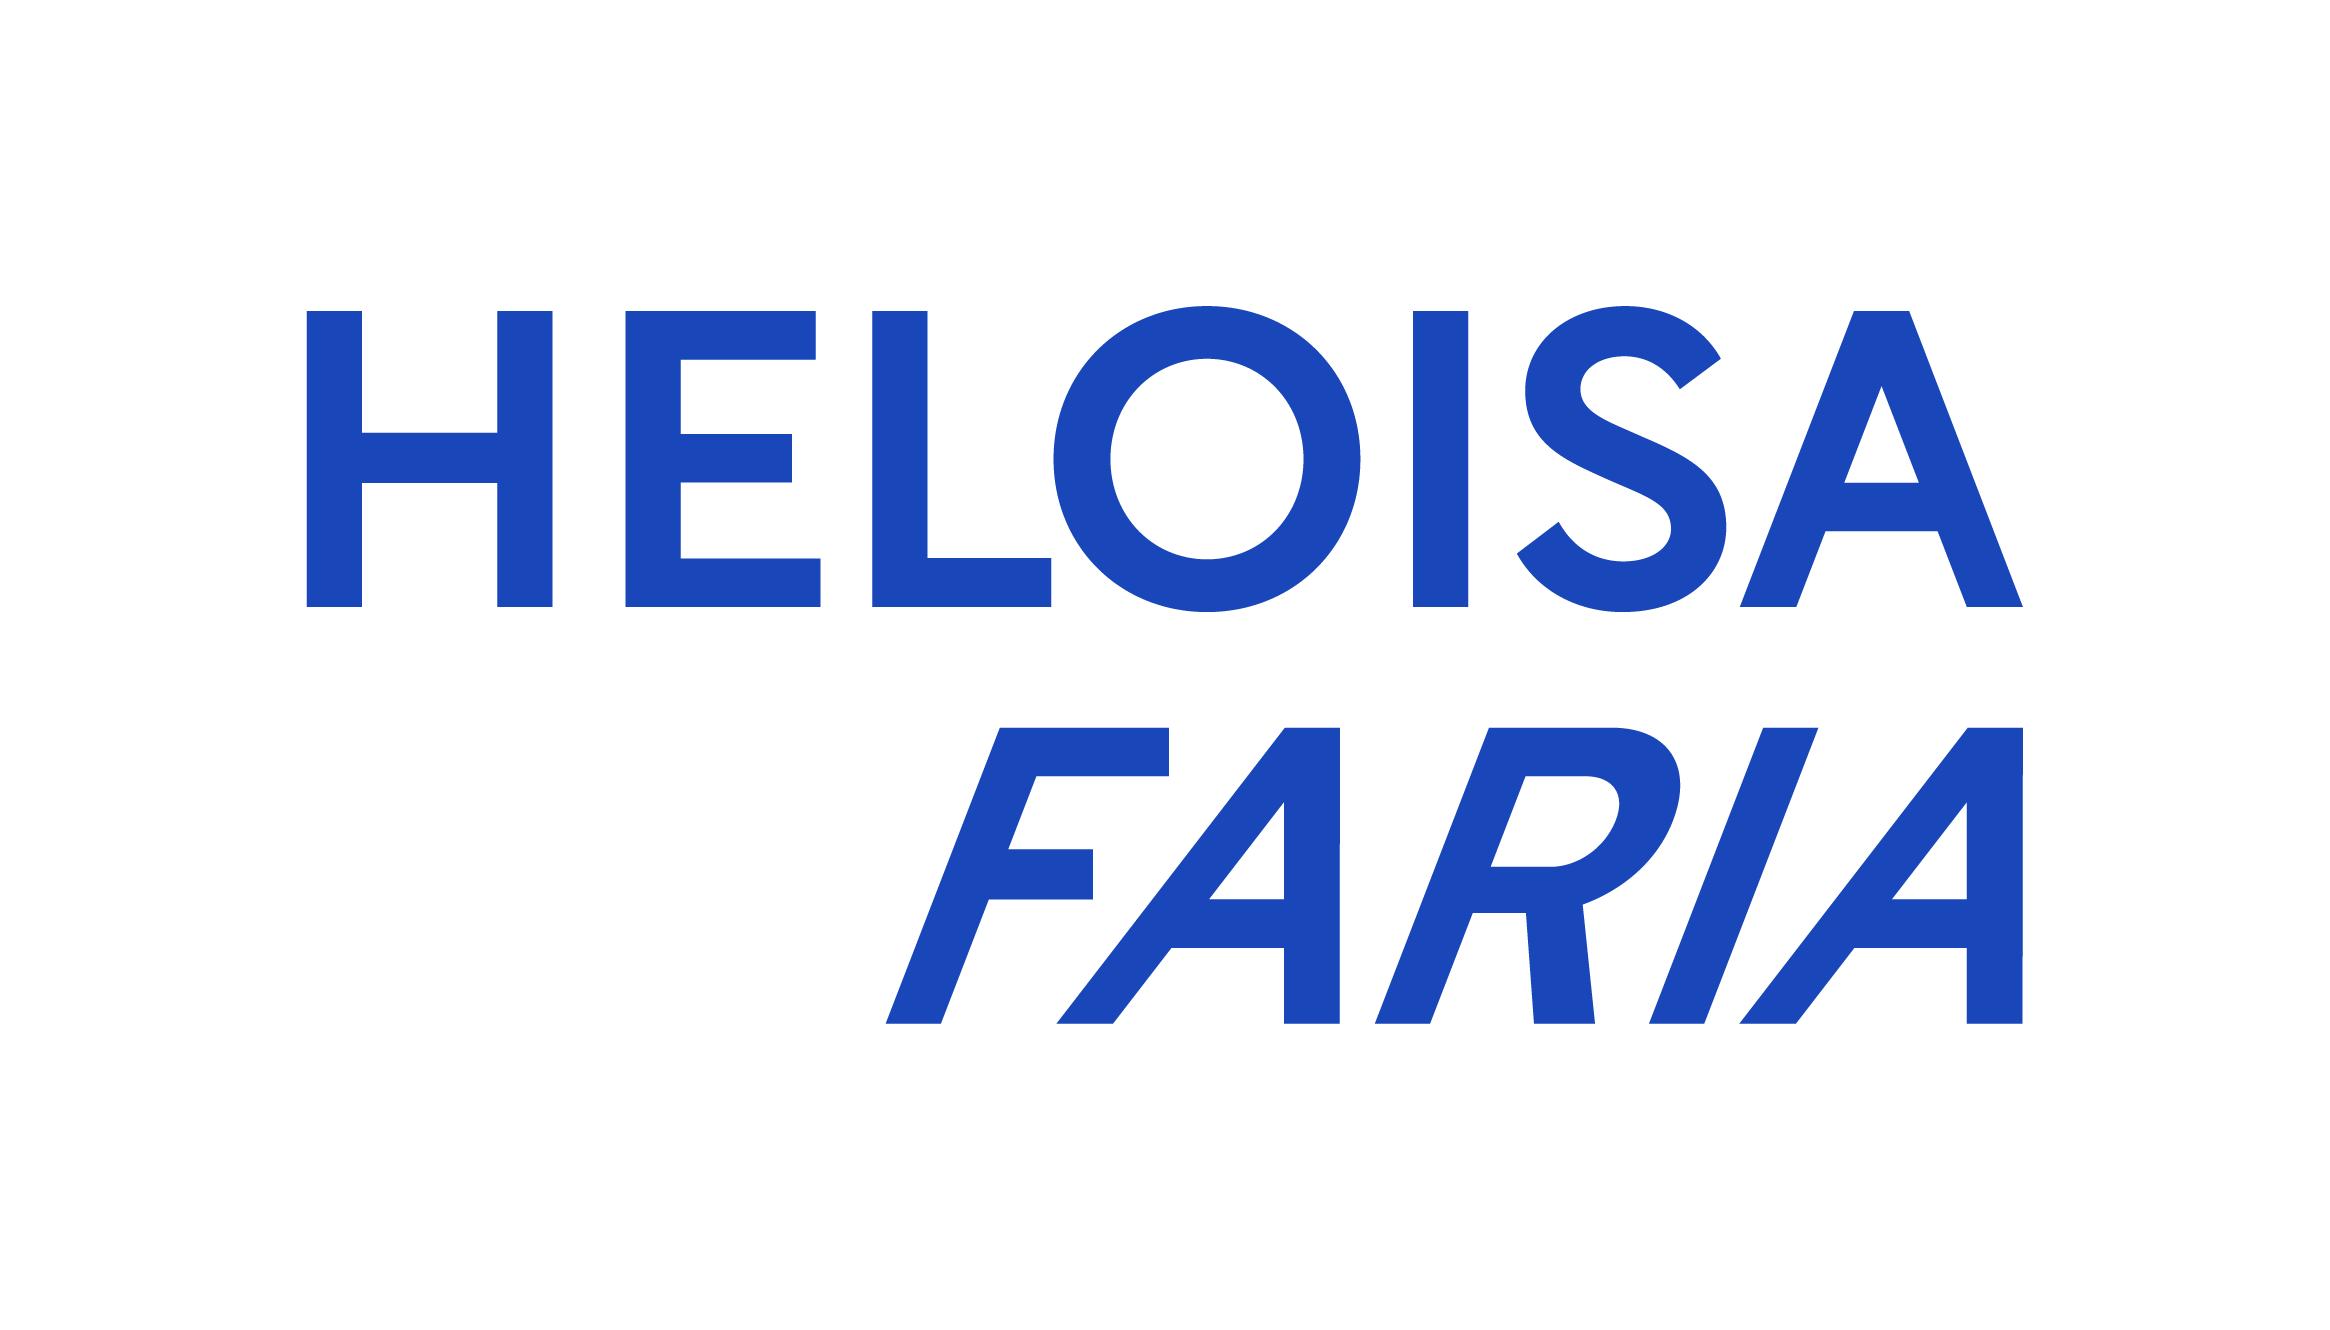 Heloisa Faria